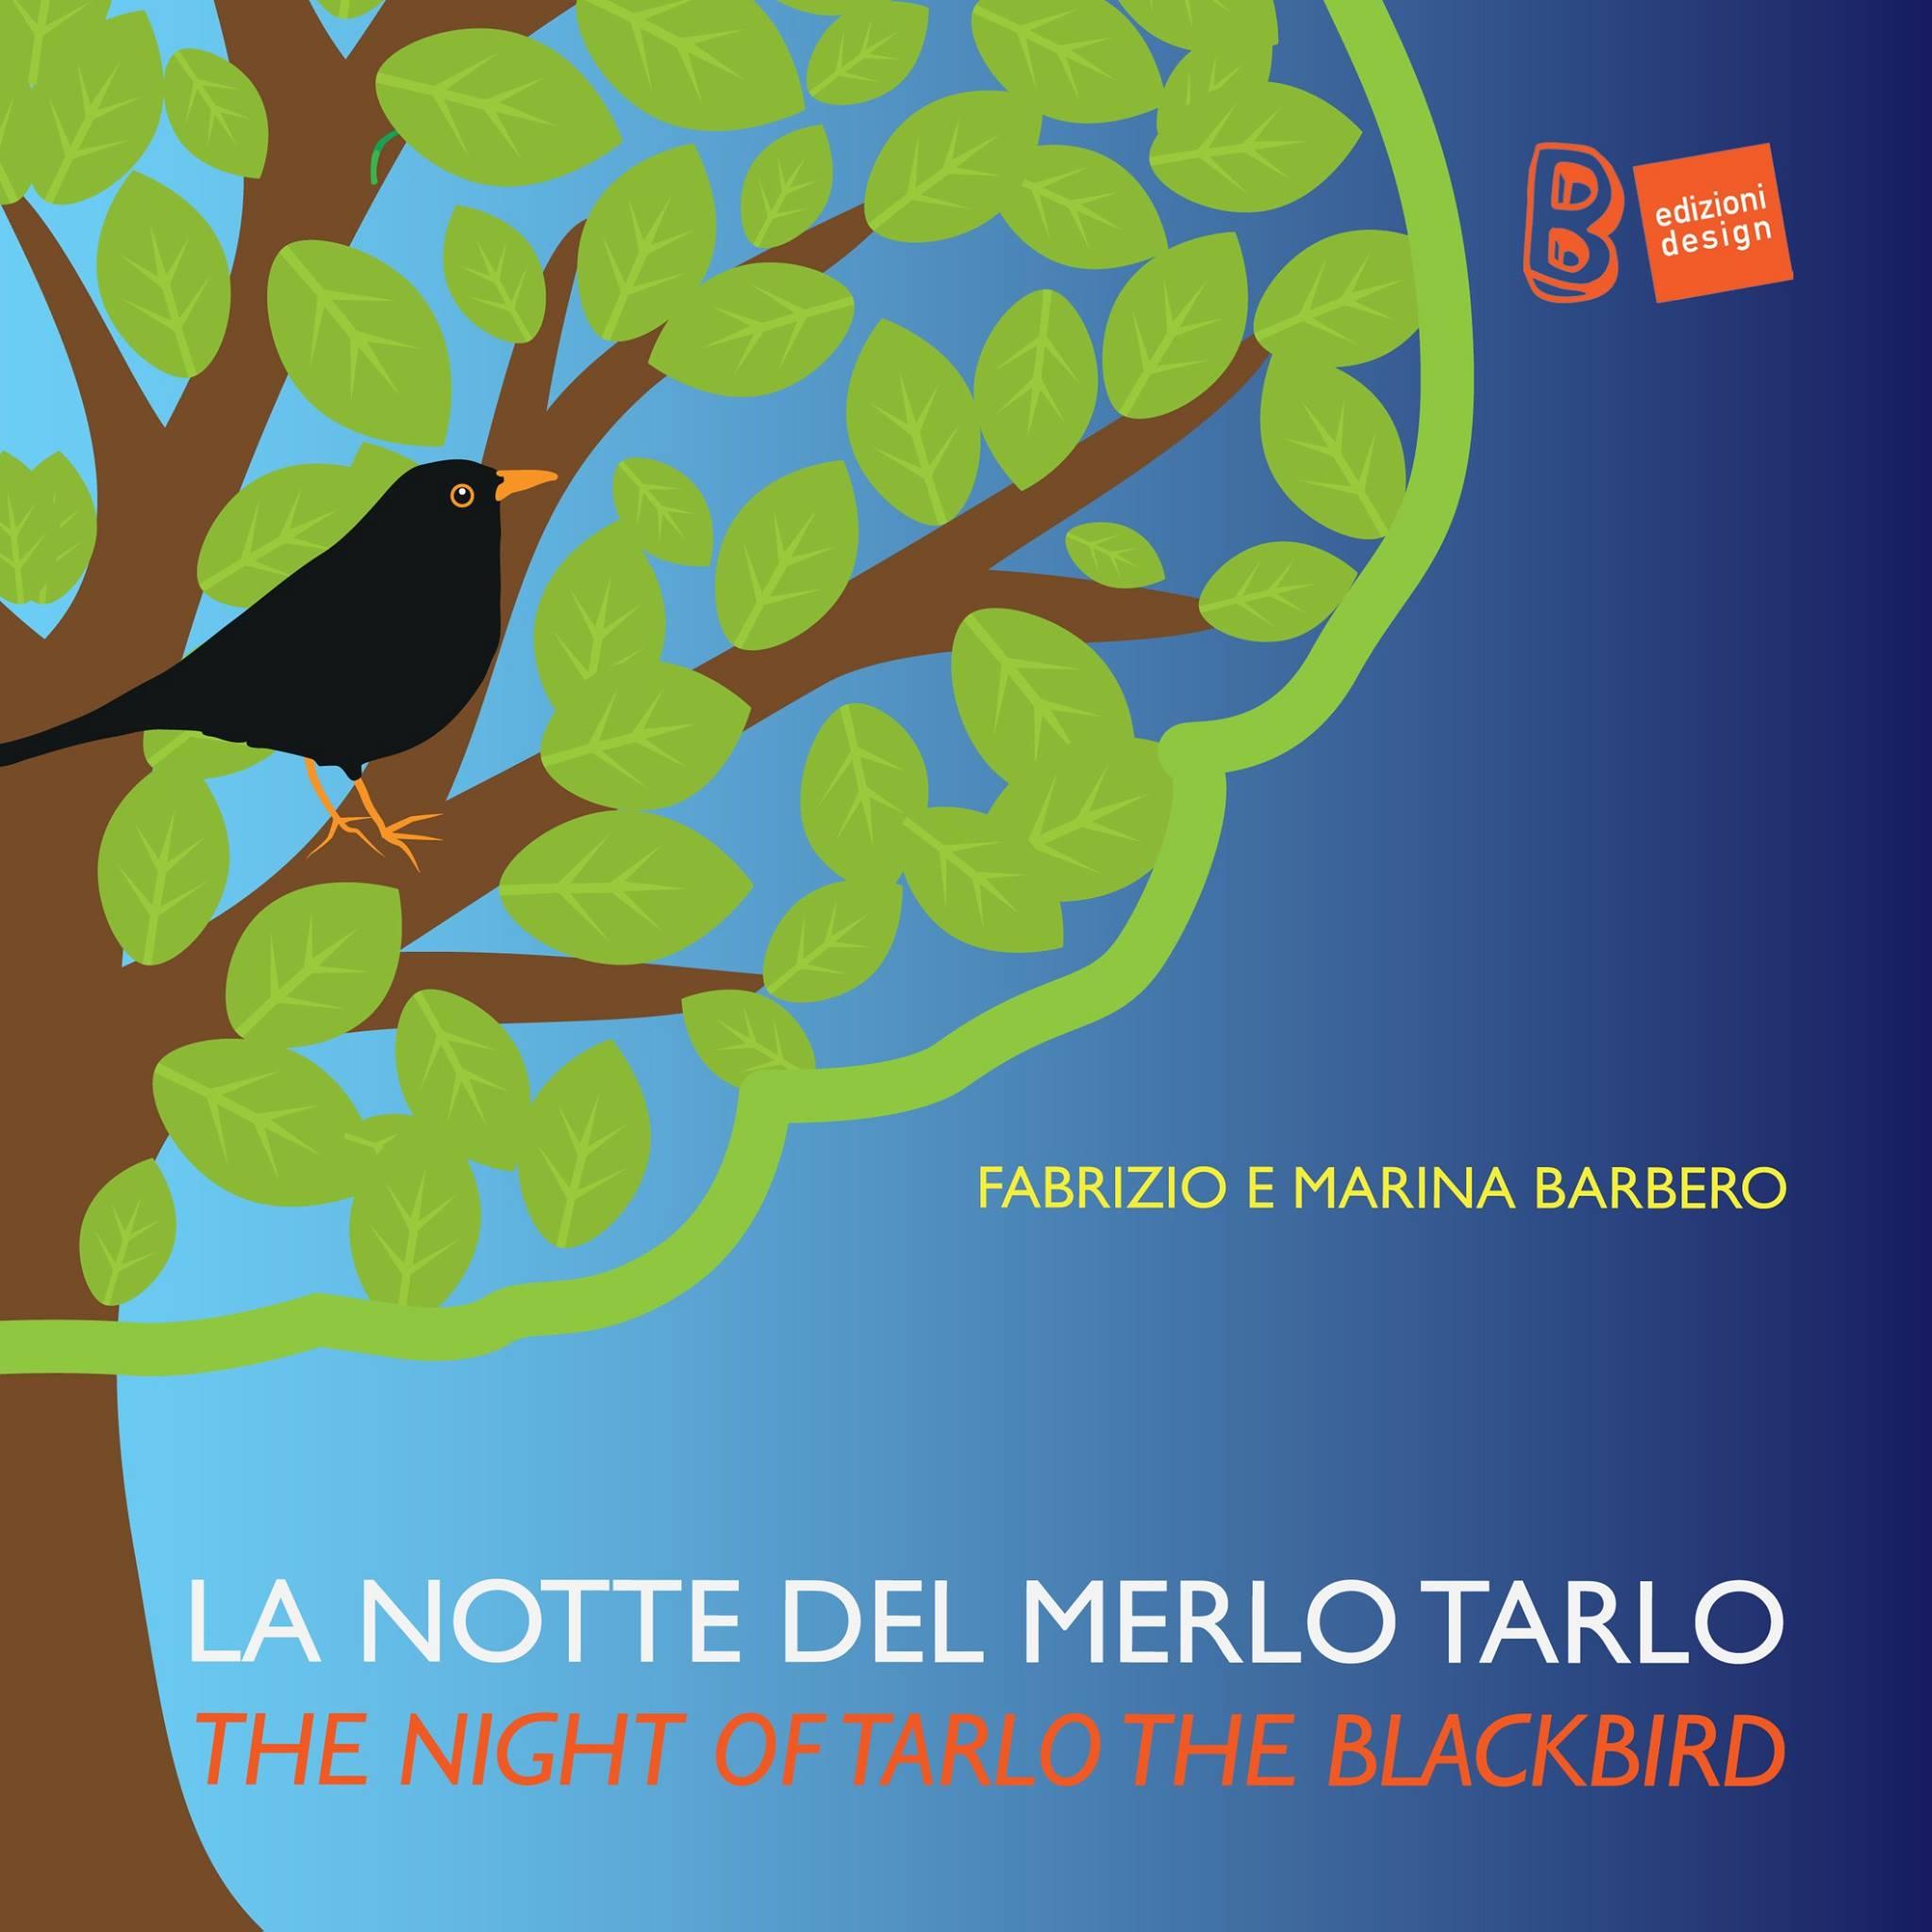 La notte del merlo Tarlo